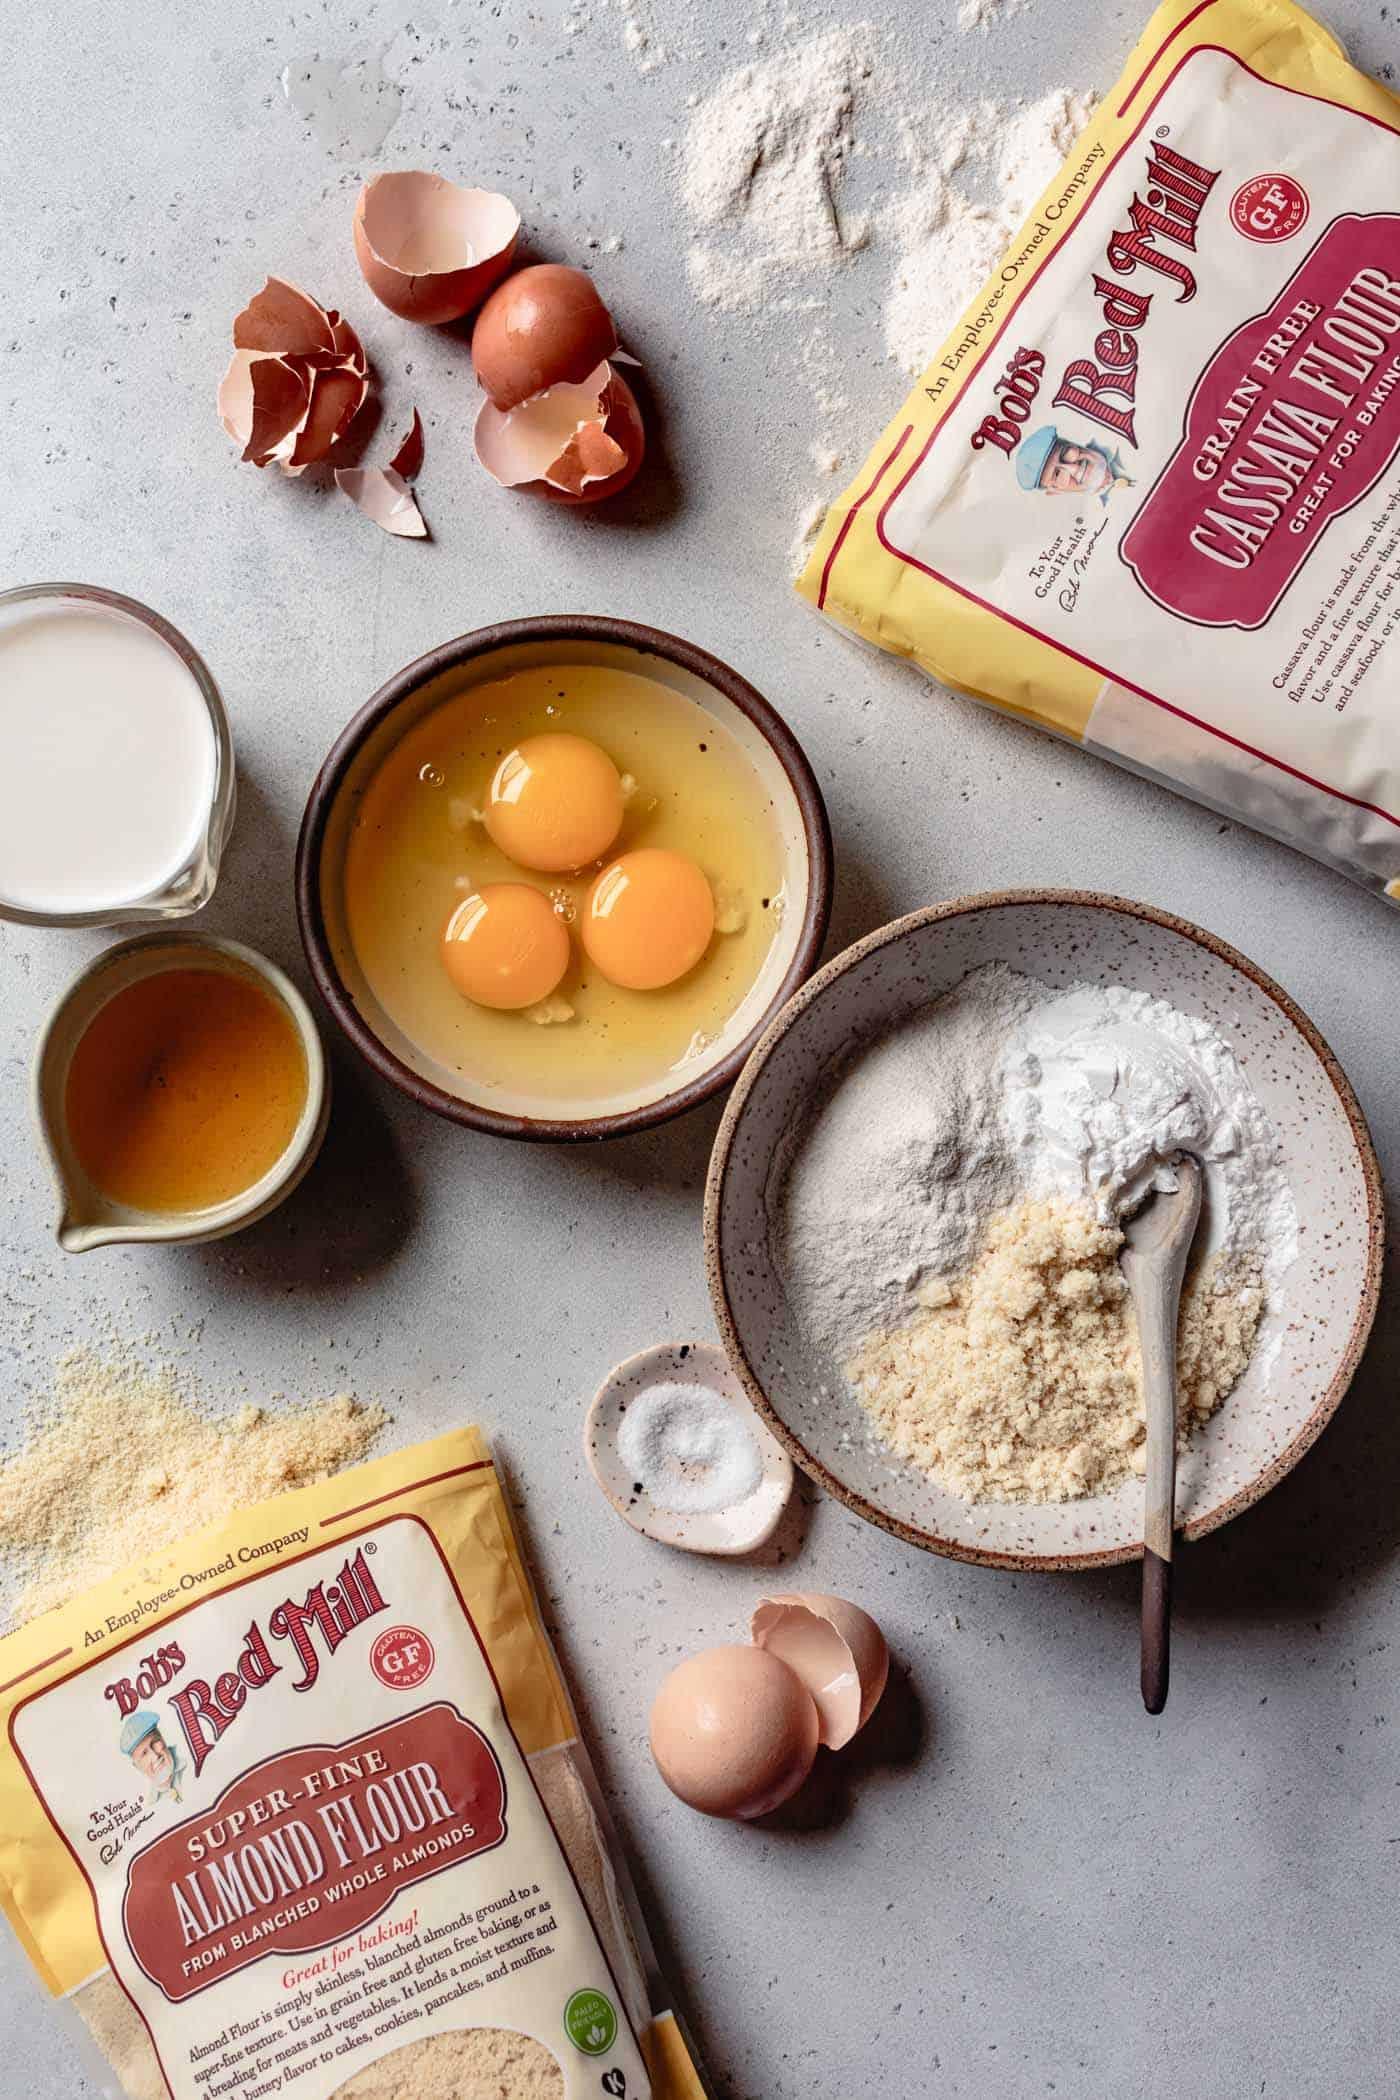 ingredients for paleo crepe recipe (eggs, milk, butter, almond flour, cassava flour)